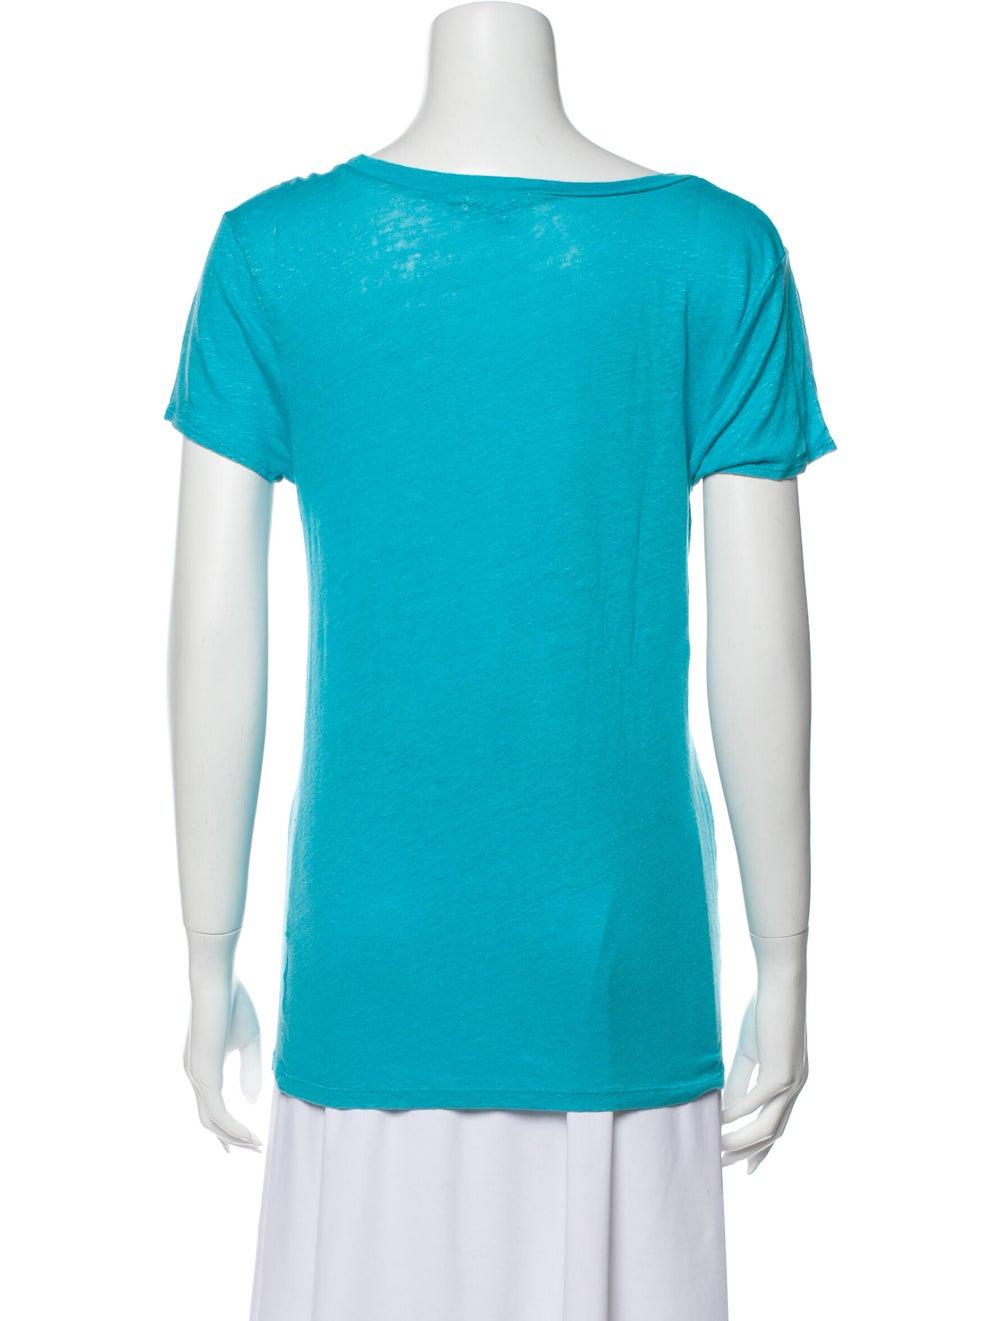 Calypso Linen Scoop Neck T-Shirt Blue - image 3